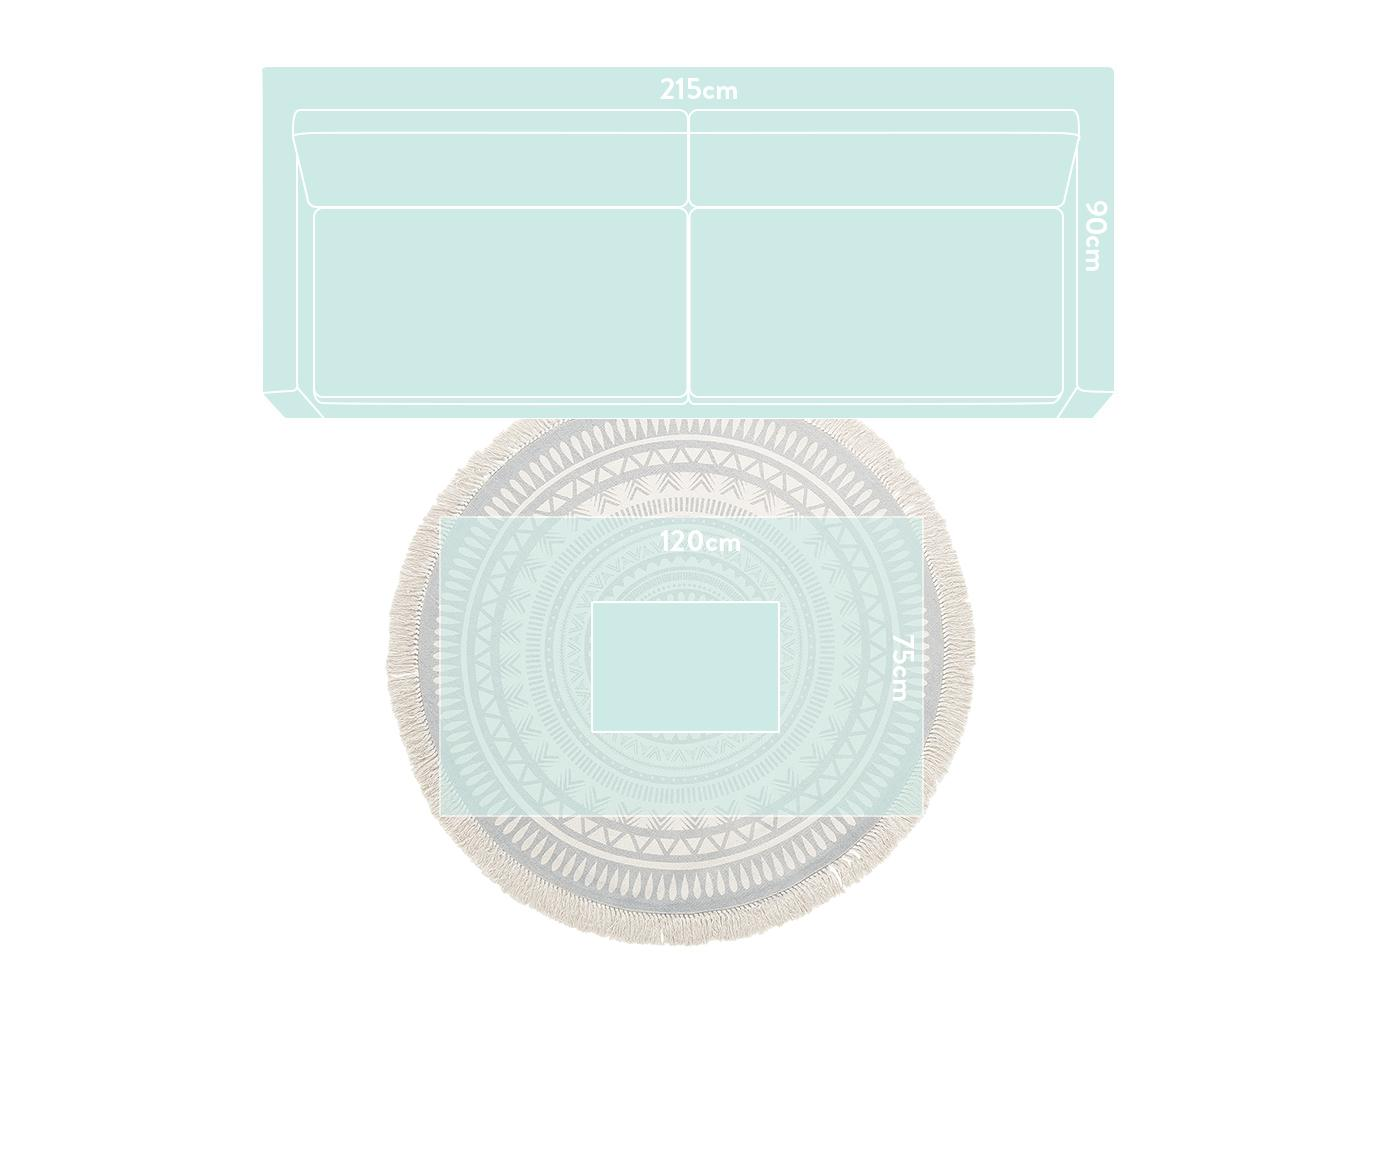 Alfombra redonda artesanal con flecos Benji, Gris claro, beige, Ø 150 cm (Tamaño M)